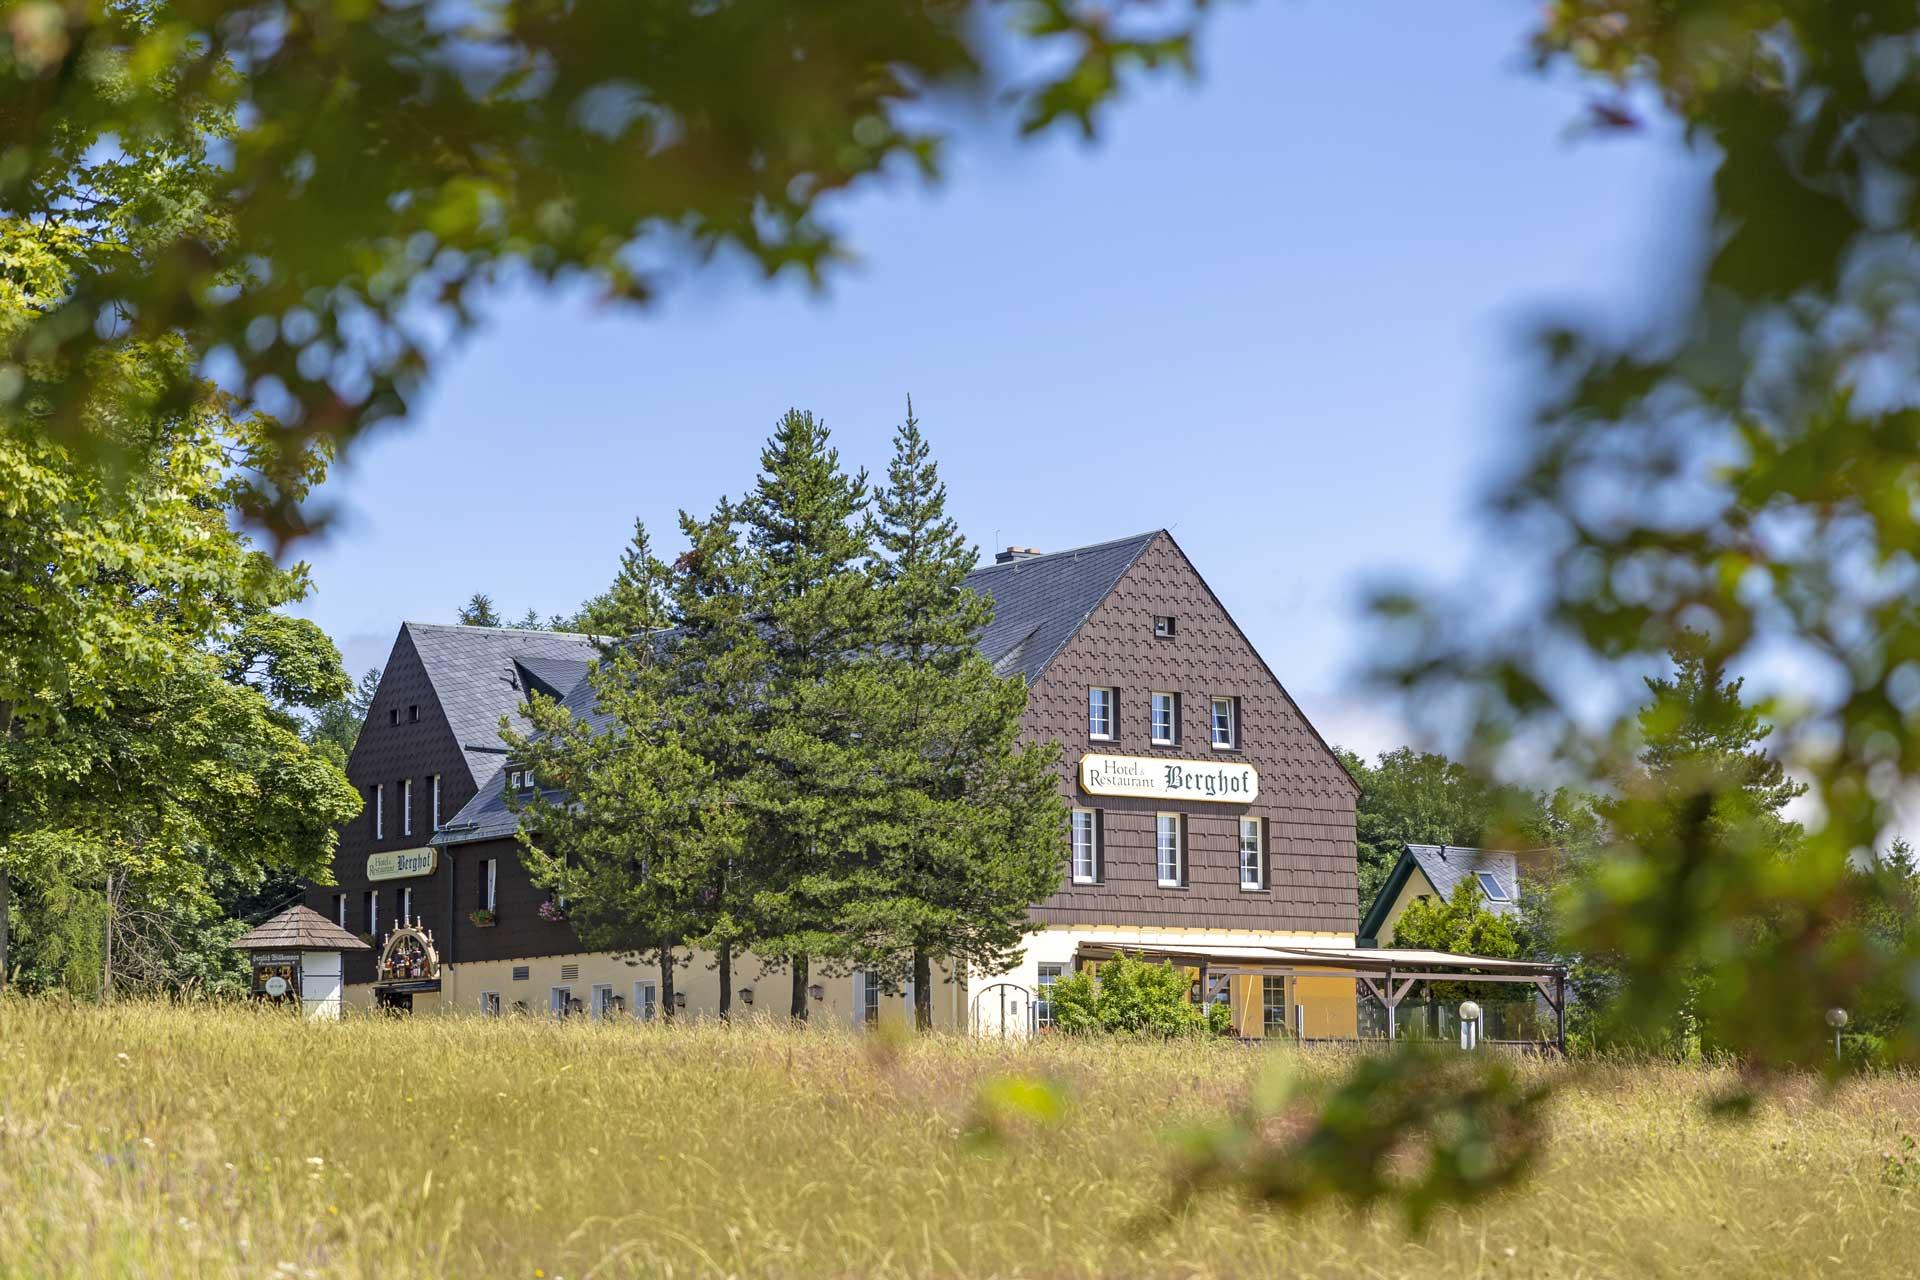 hotel-berghof-hausansicht_feld2